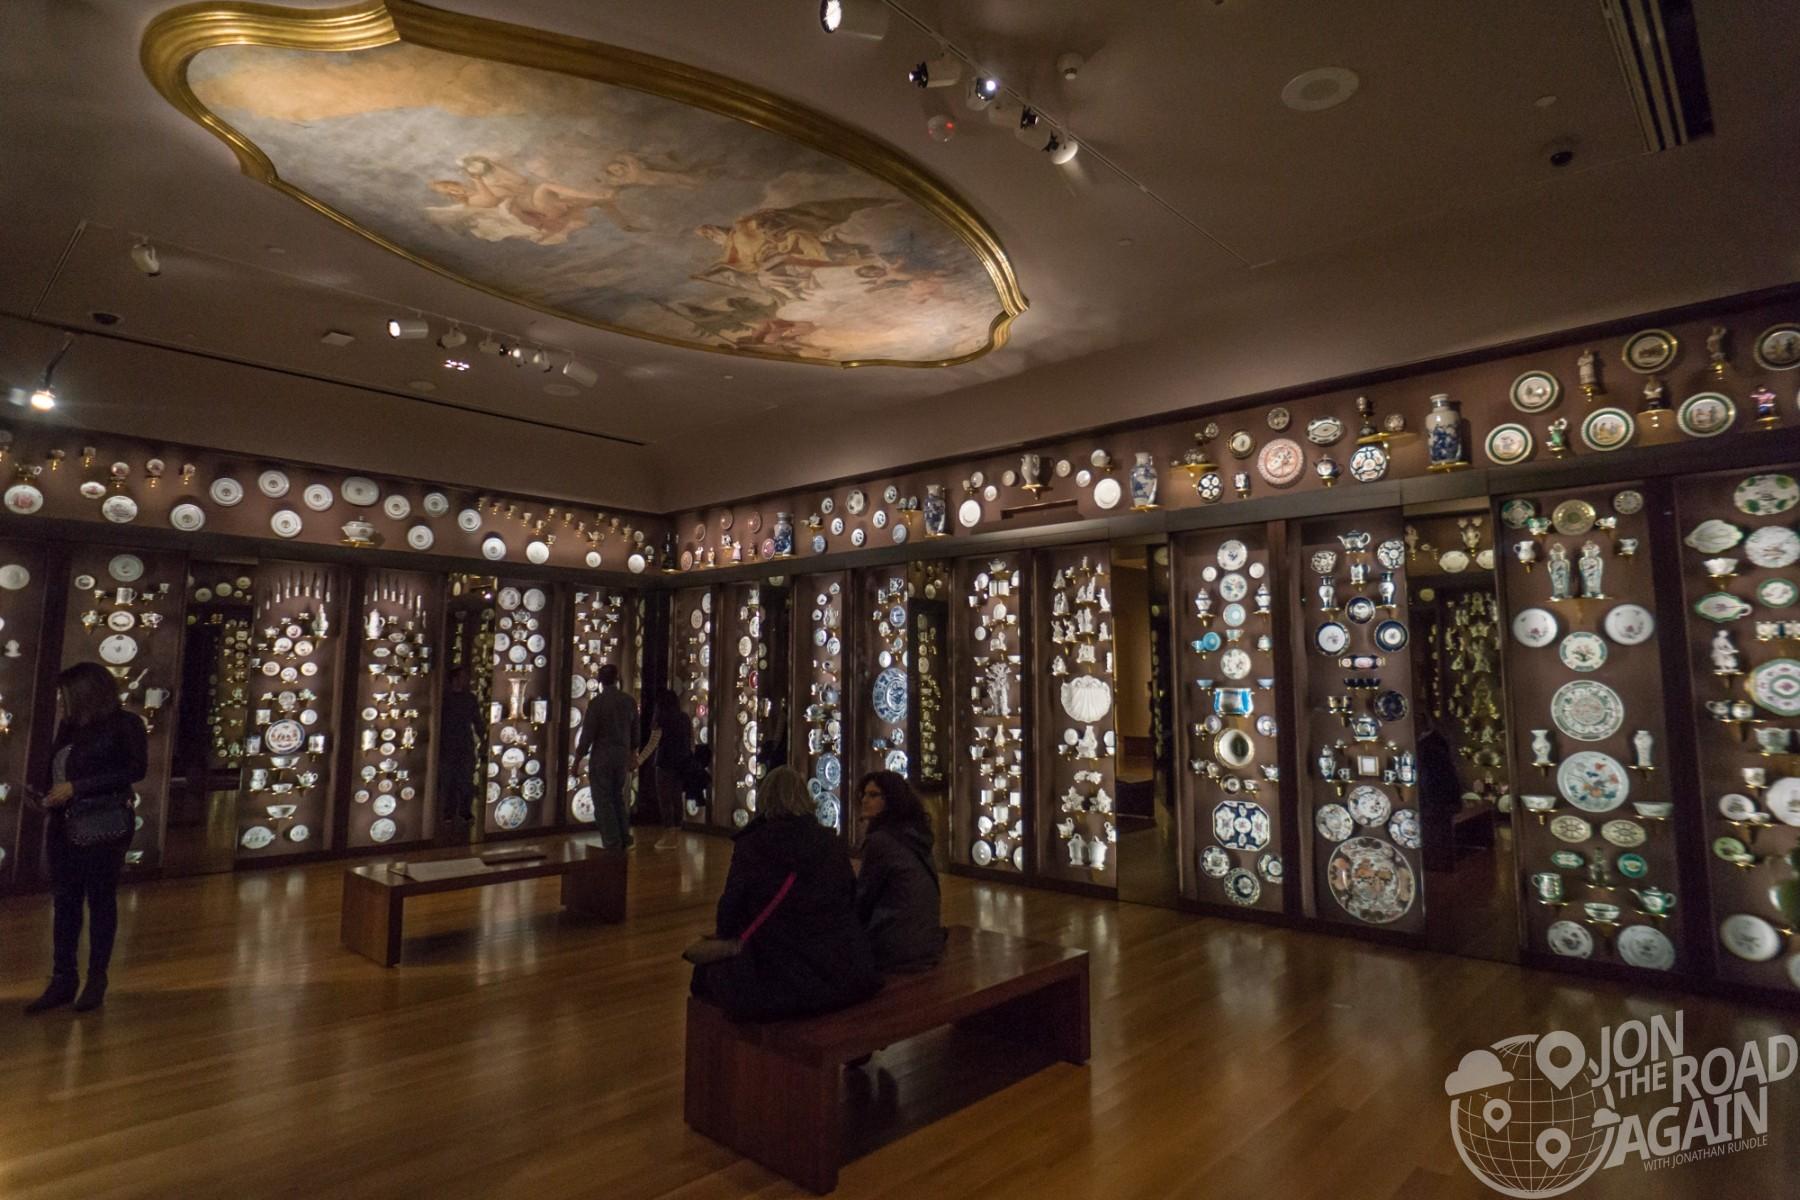 Seattle Art Museum Porcelain Room